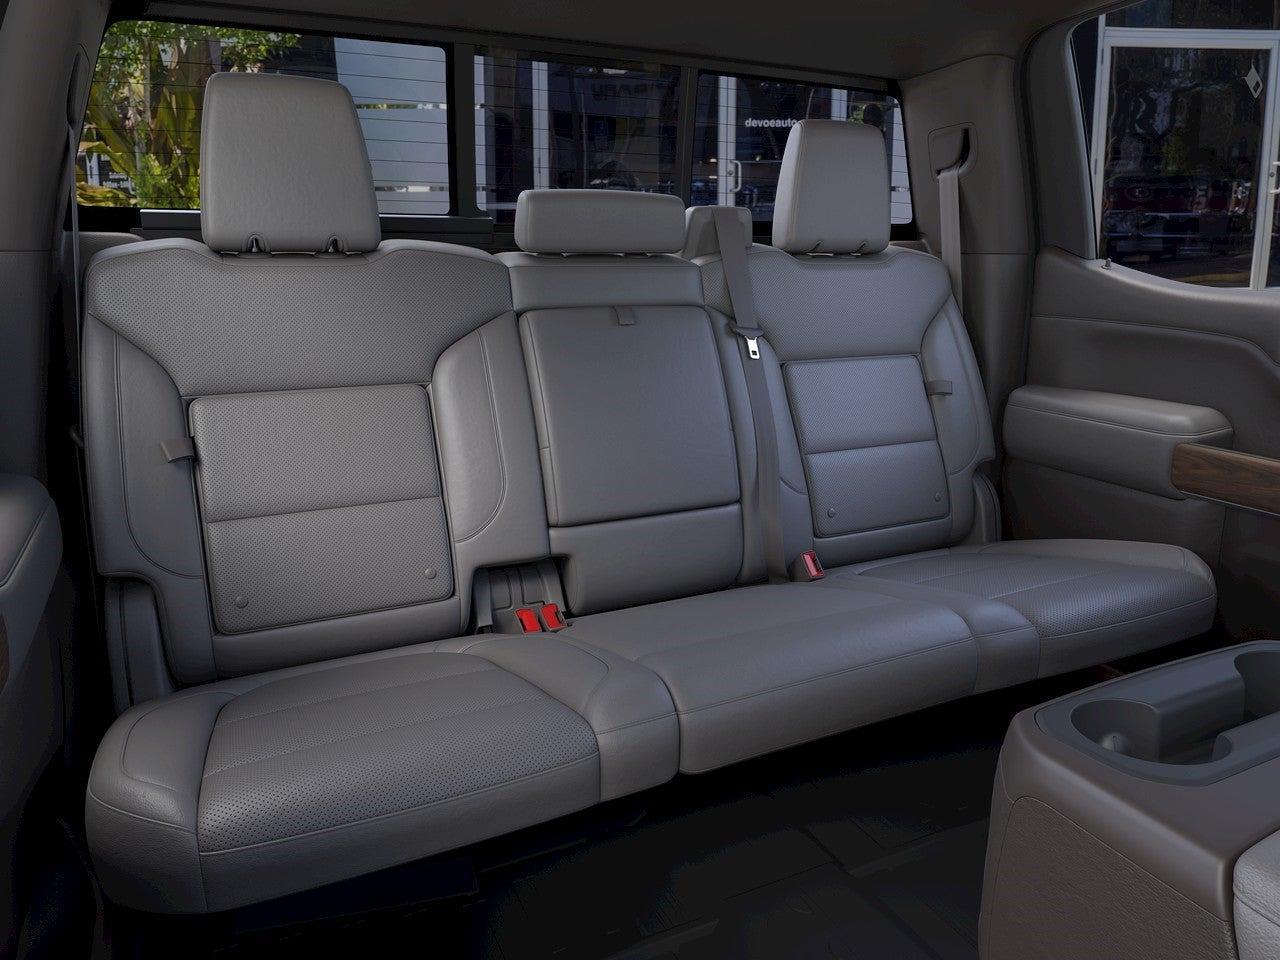 2021 GMC Sierra 1500 Crew Cab 4x4, Pickup #T21441 - photo 16